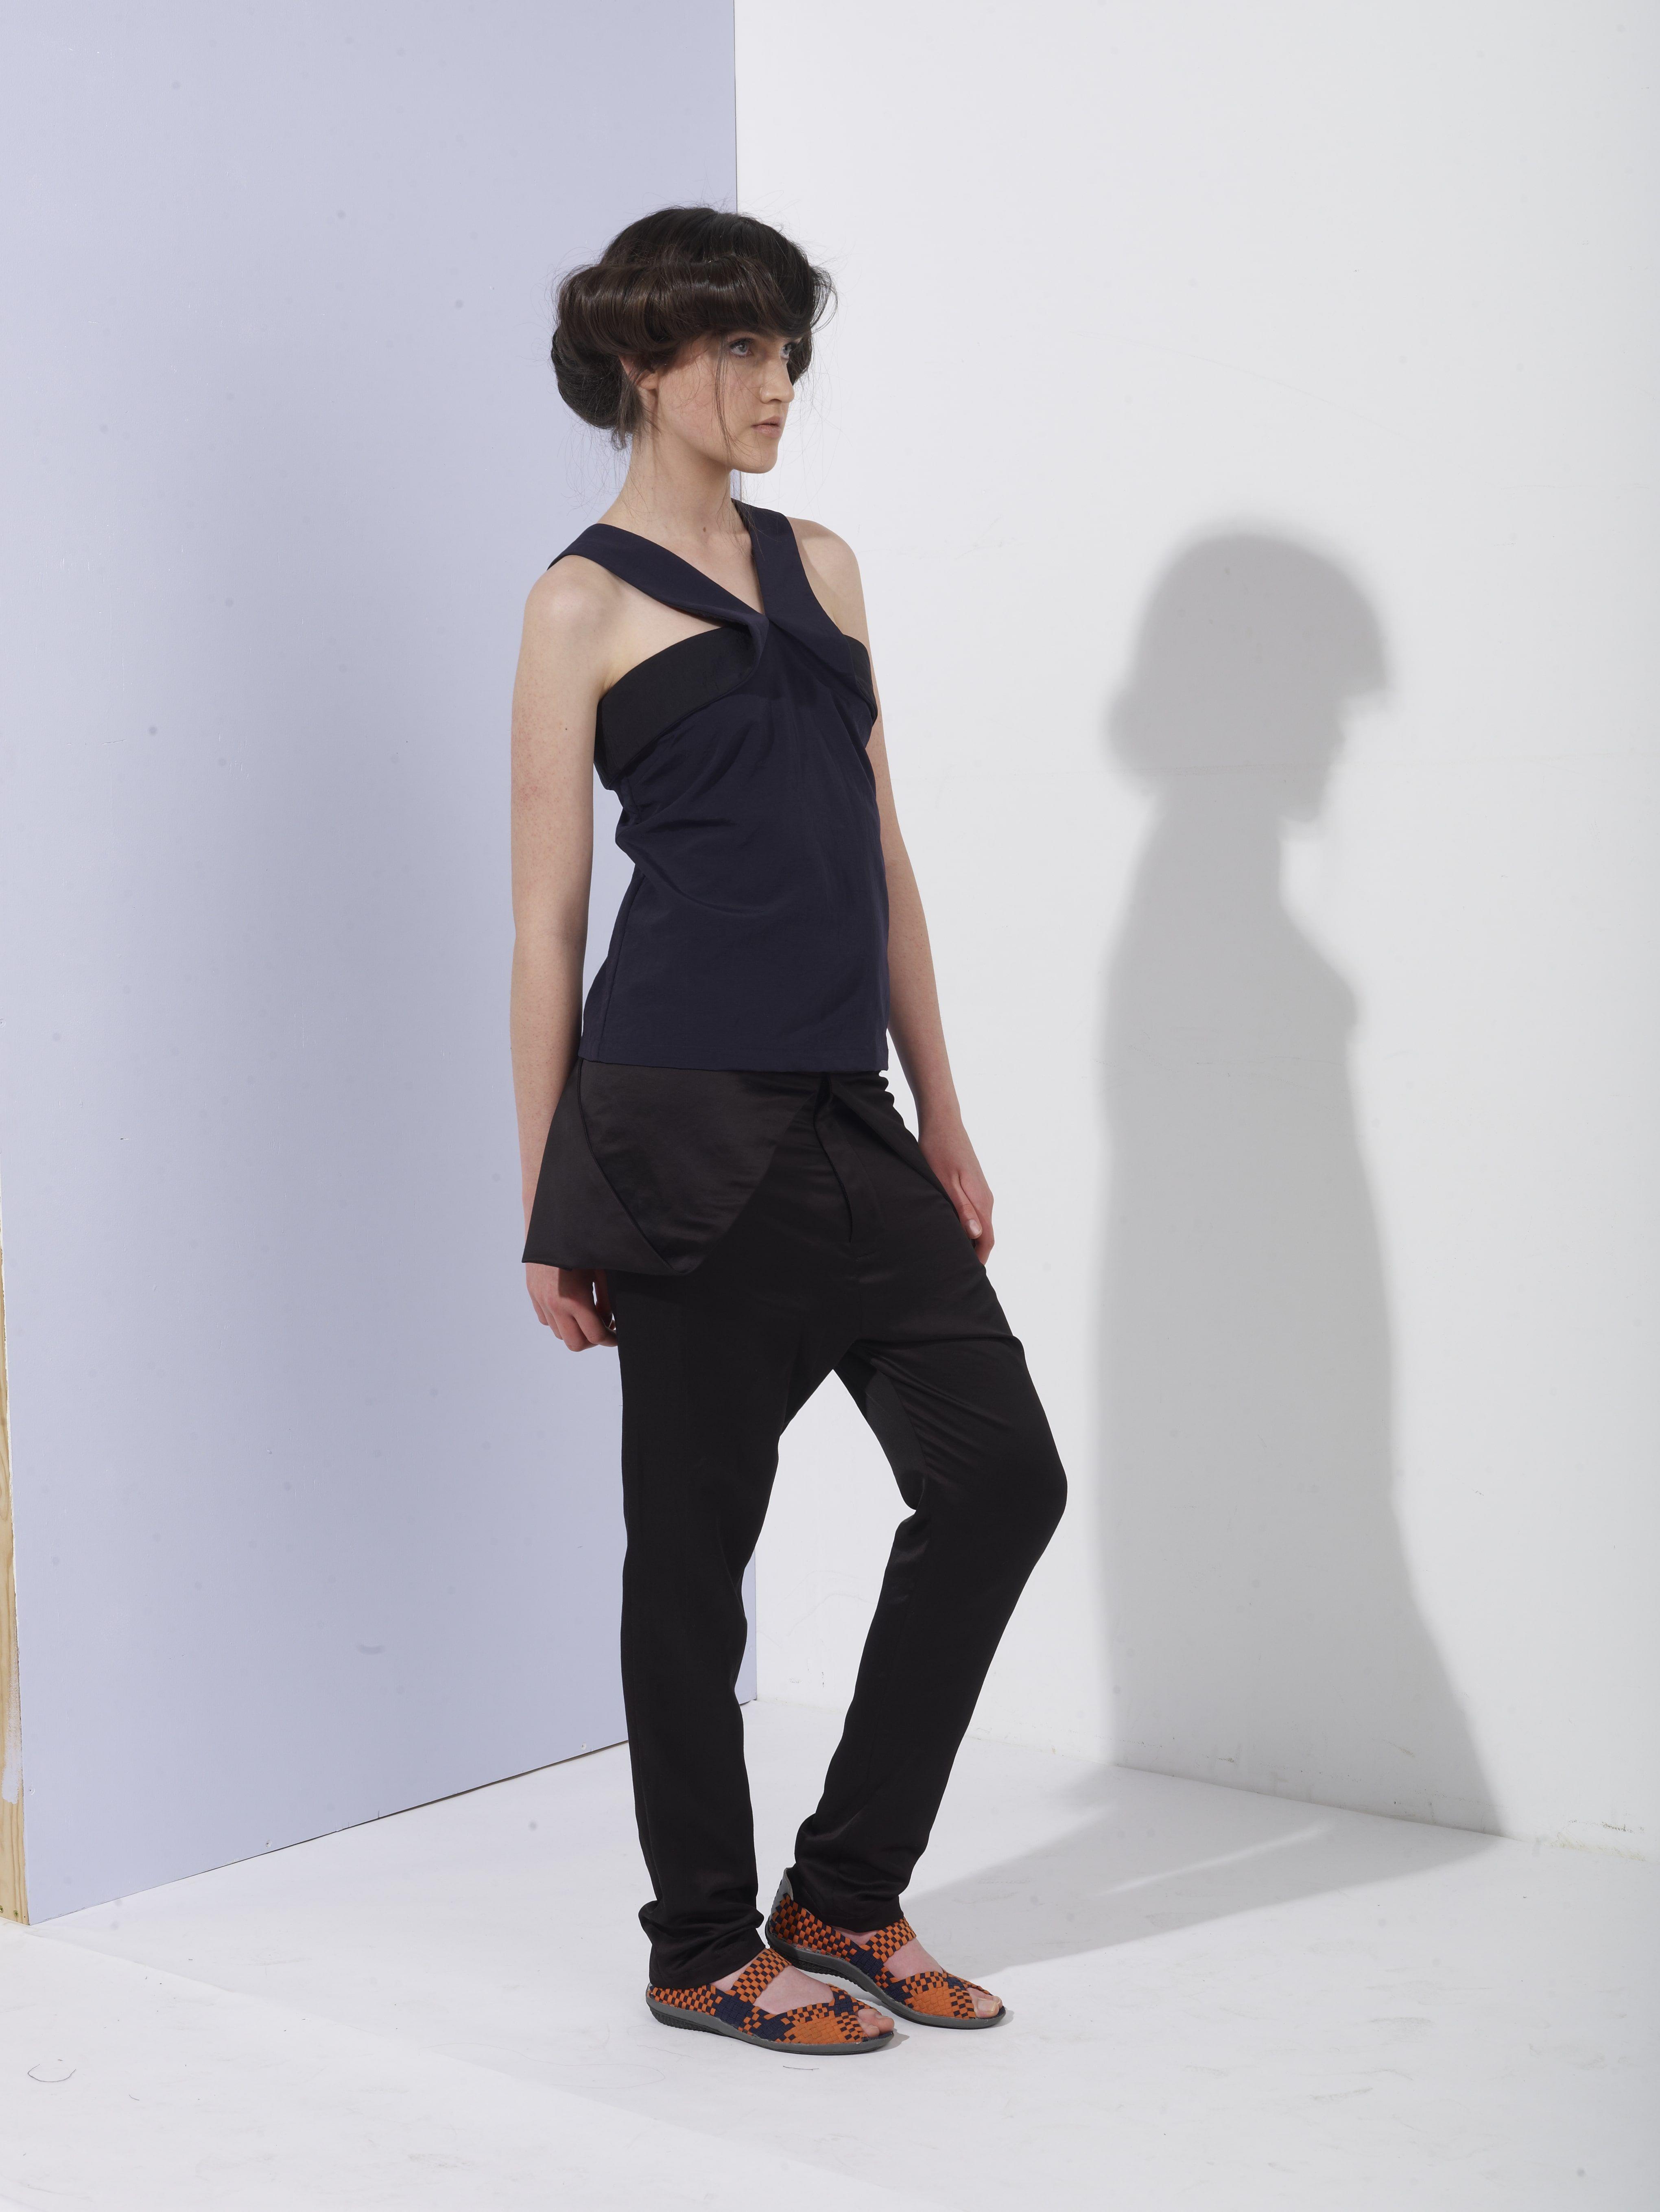 RAGGATT SS14 Collection :: Melbourne based fashion label ::